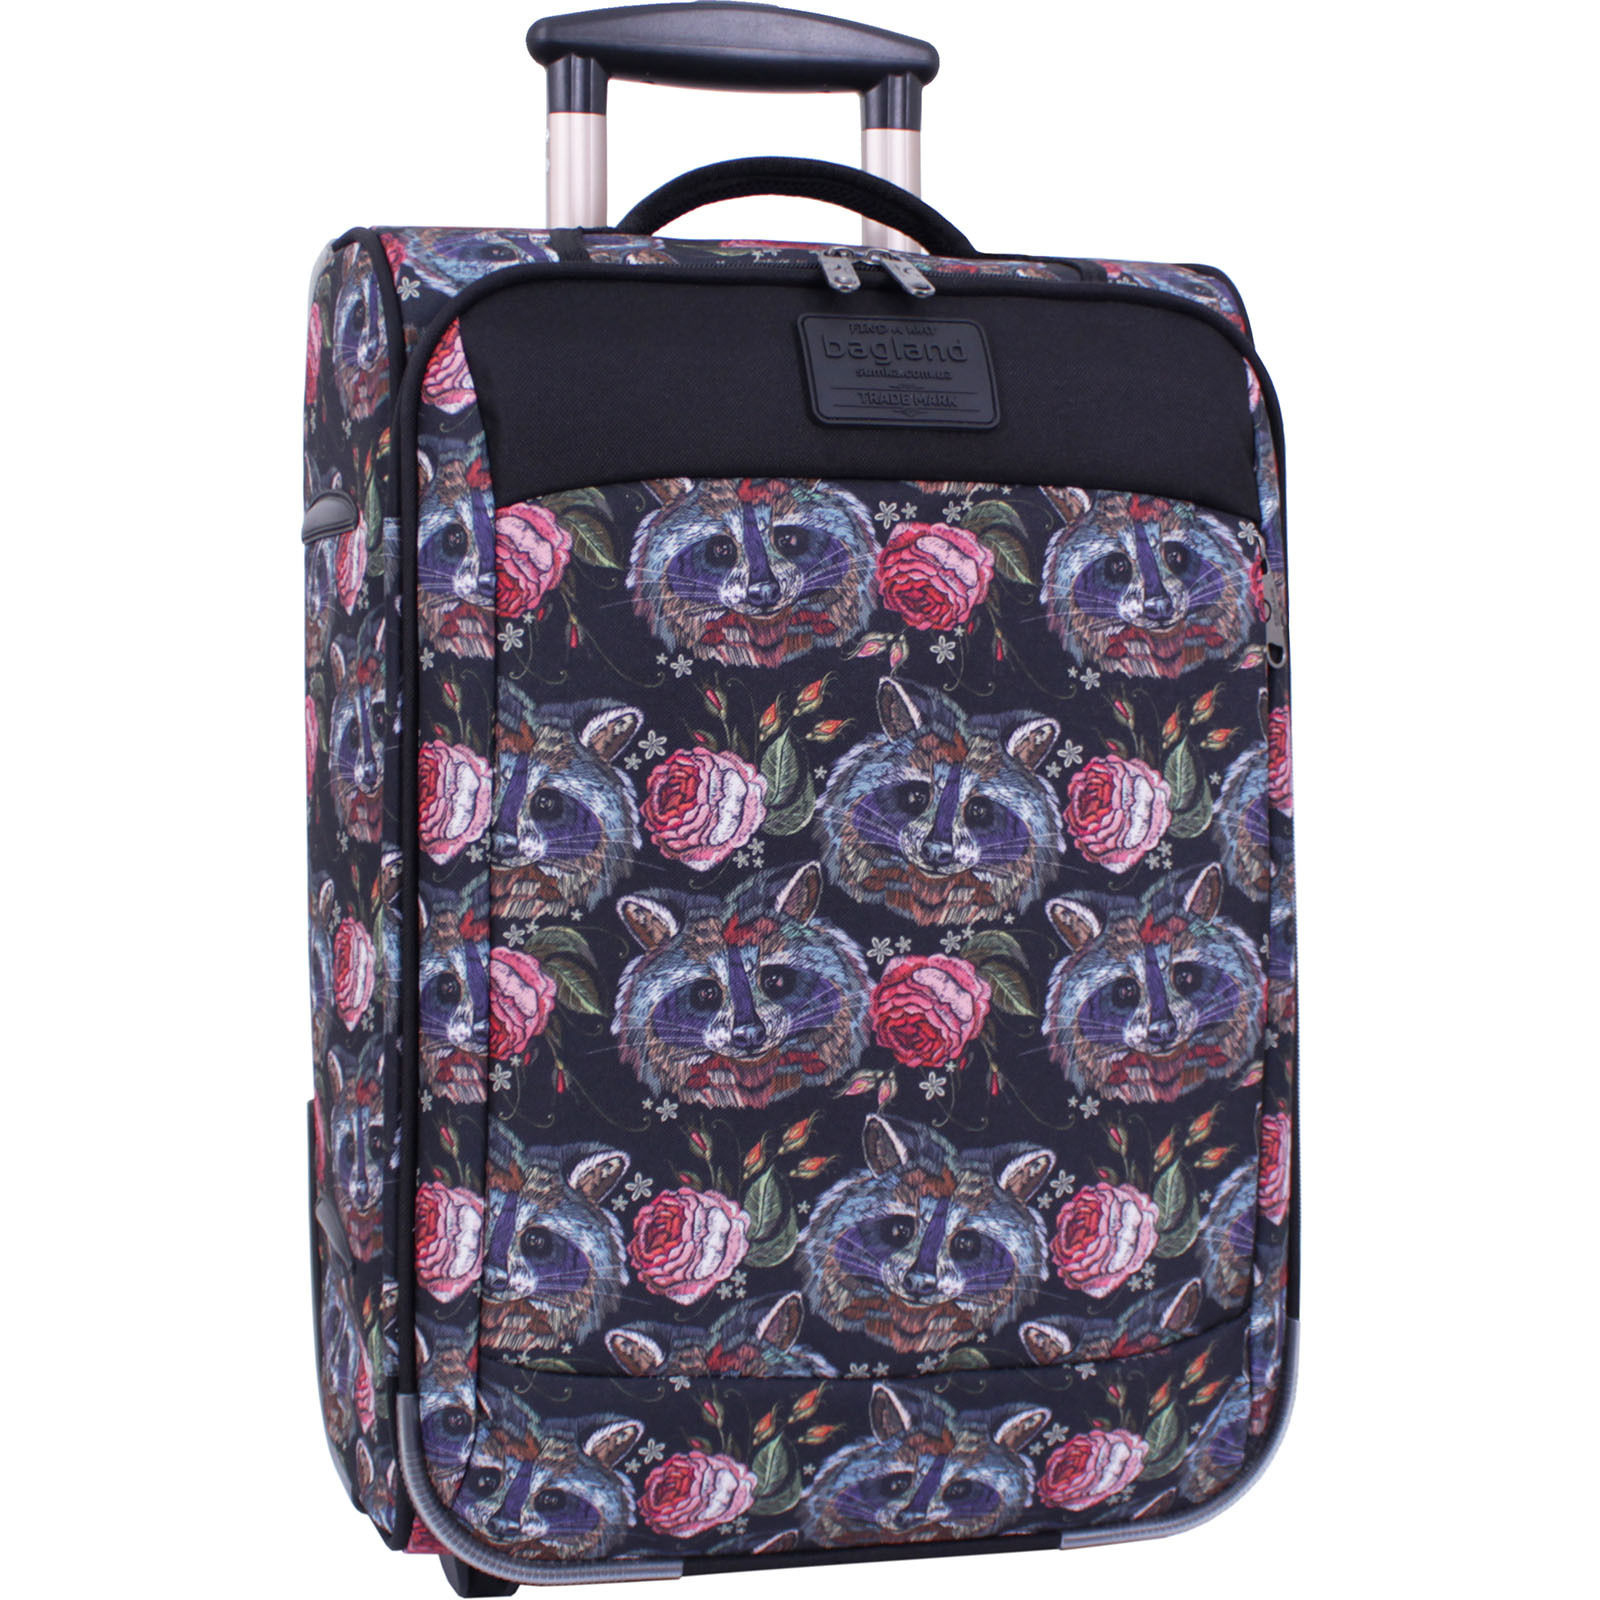 Дорожные чемоданы Чемодан Bagland Vichenzo 32 л. сублімація 477 (0037666194) IMG_4044_суб.477_.JPG